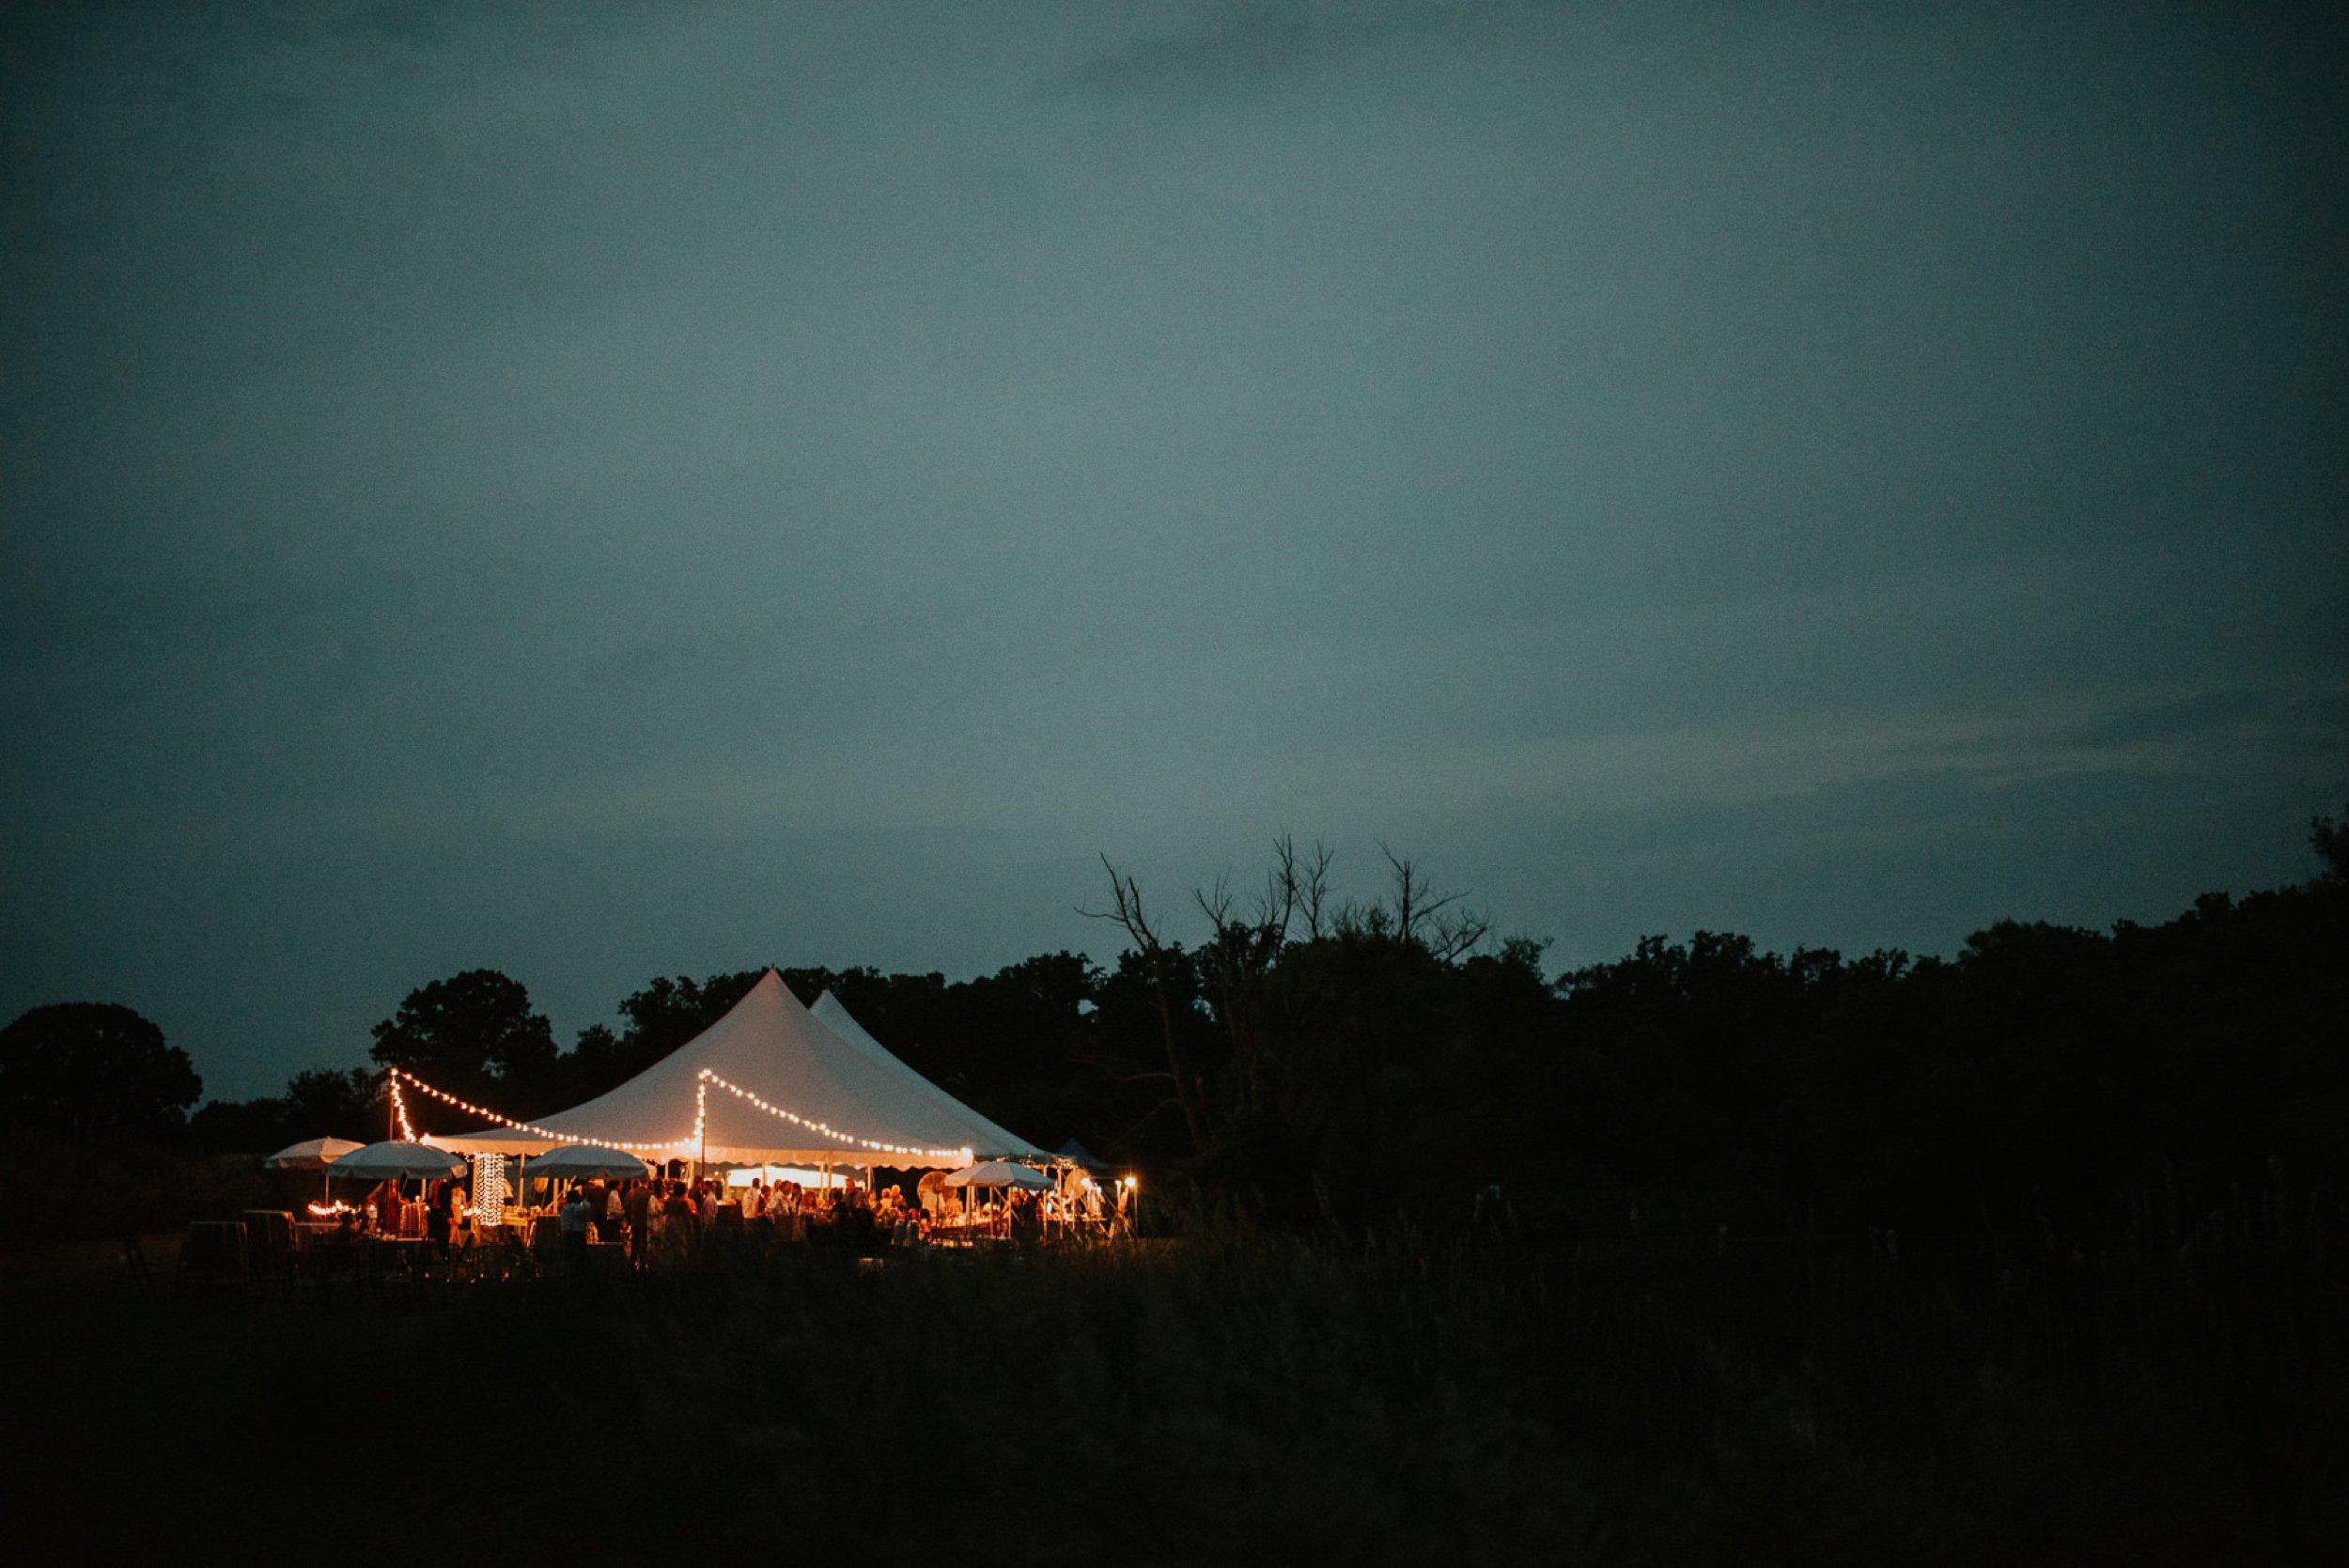 milburn_farms-wedding-112.jpg